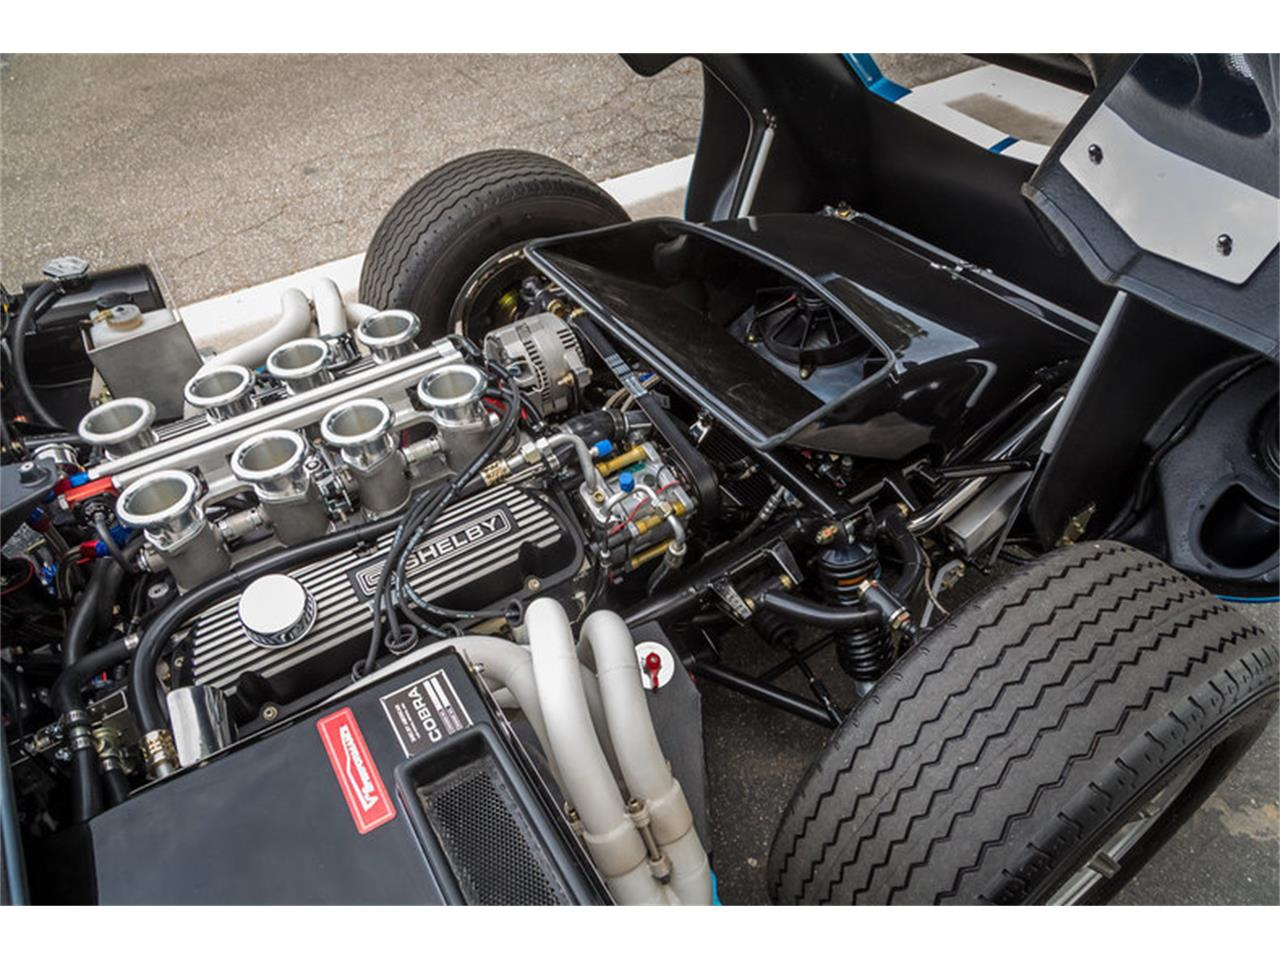 Large Picture of '65 Daytona located in Irvine California - $249,000.00 - LAR4